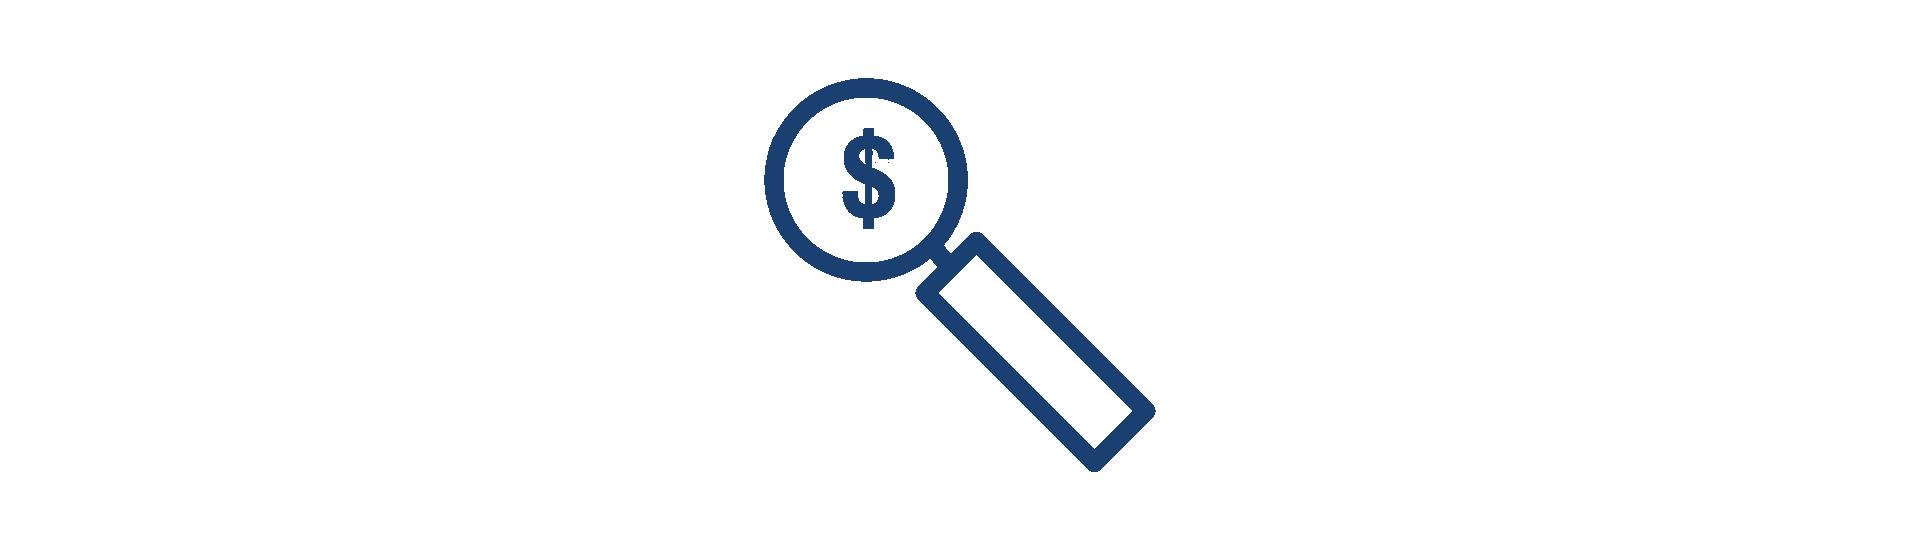 Commercial Bridge Loan | Pennant Financial